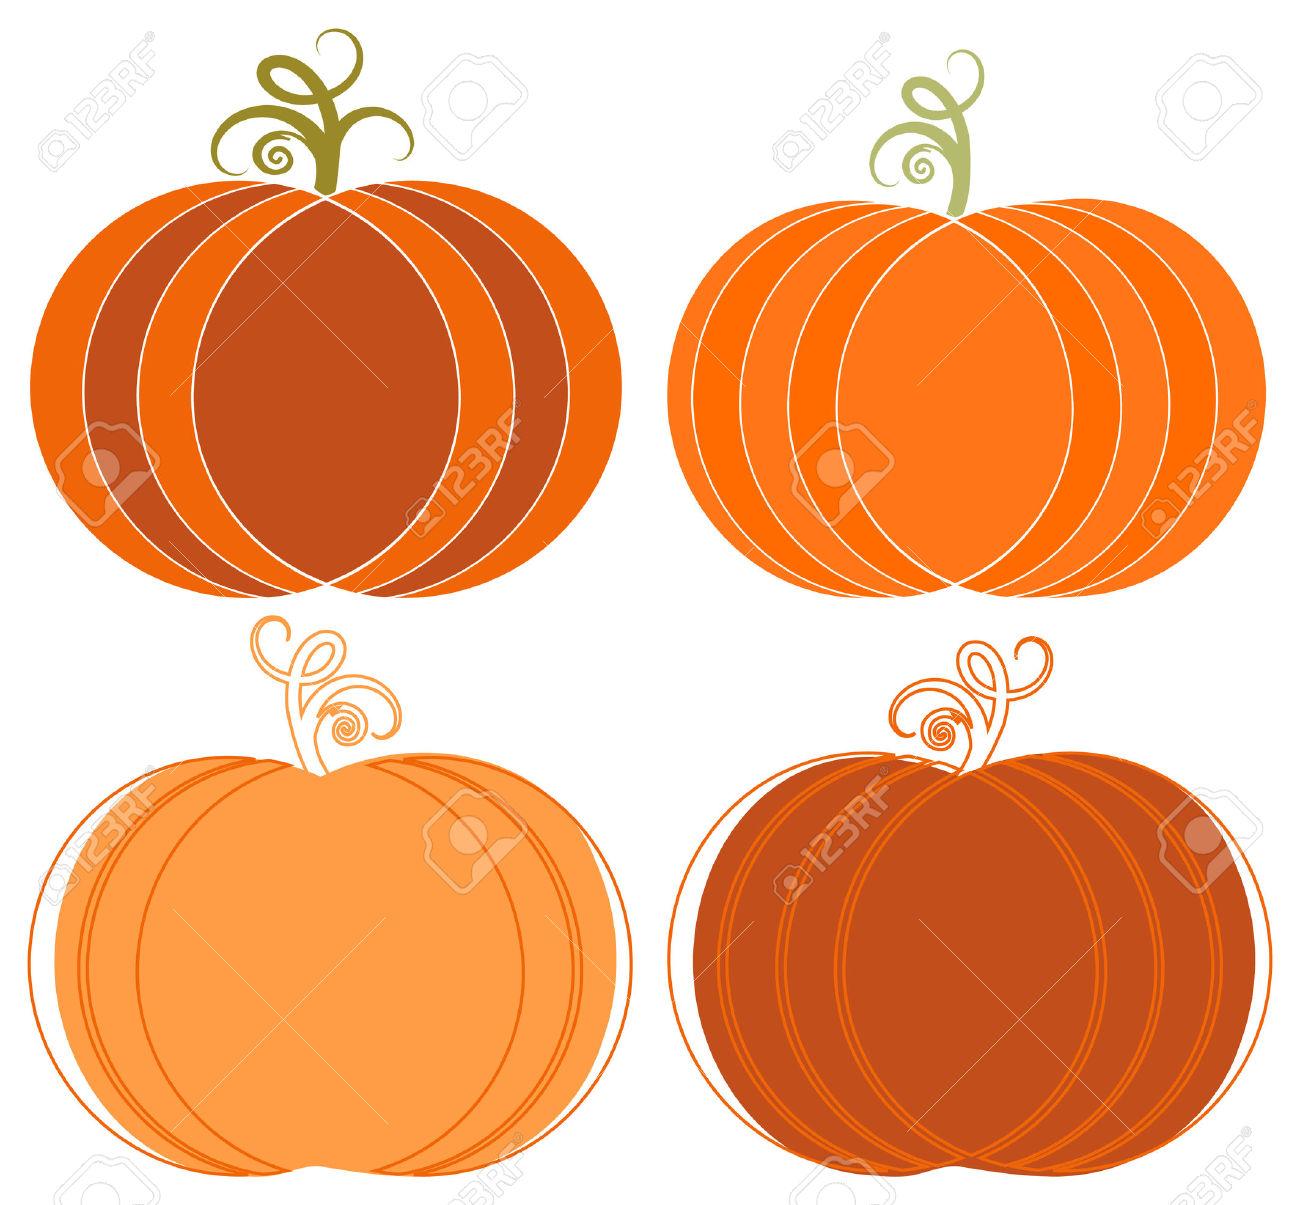 Halloween Pumpkin Images Clip Art.Whimsical Halloween Pumpkins Clip Art Set Royalty Free